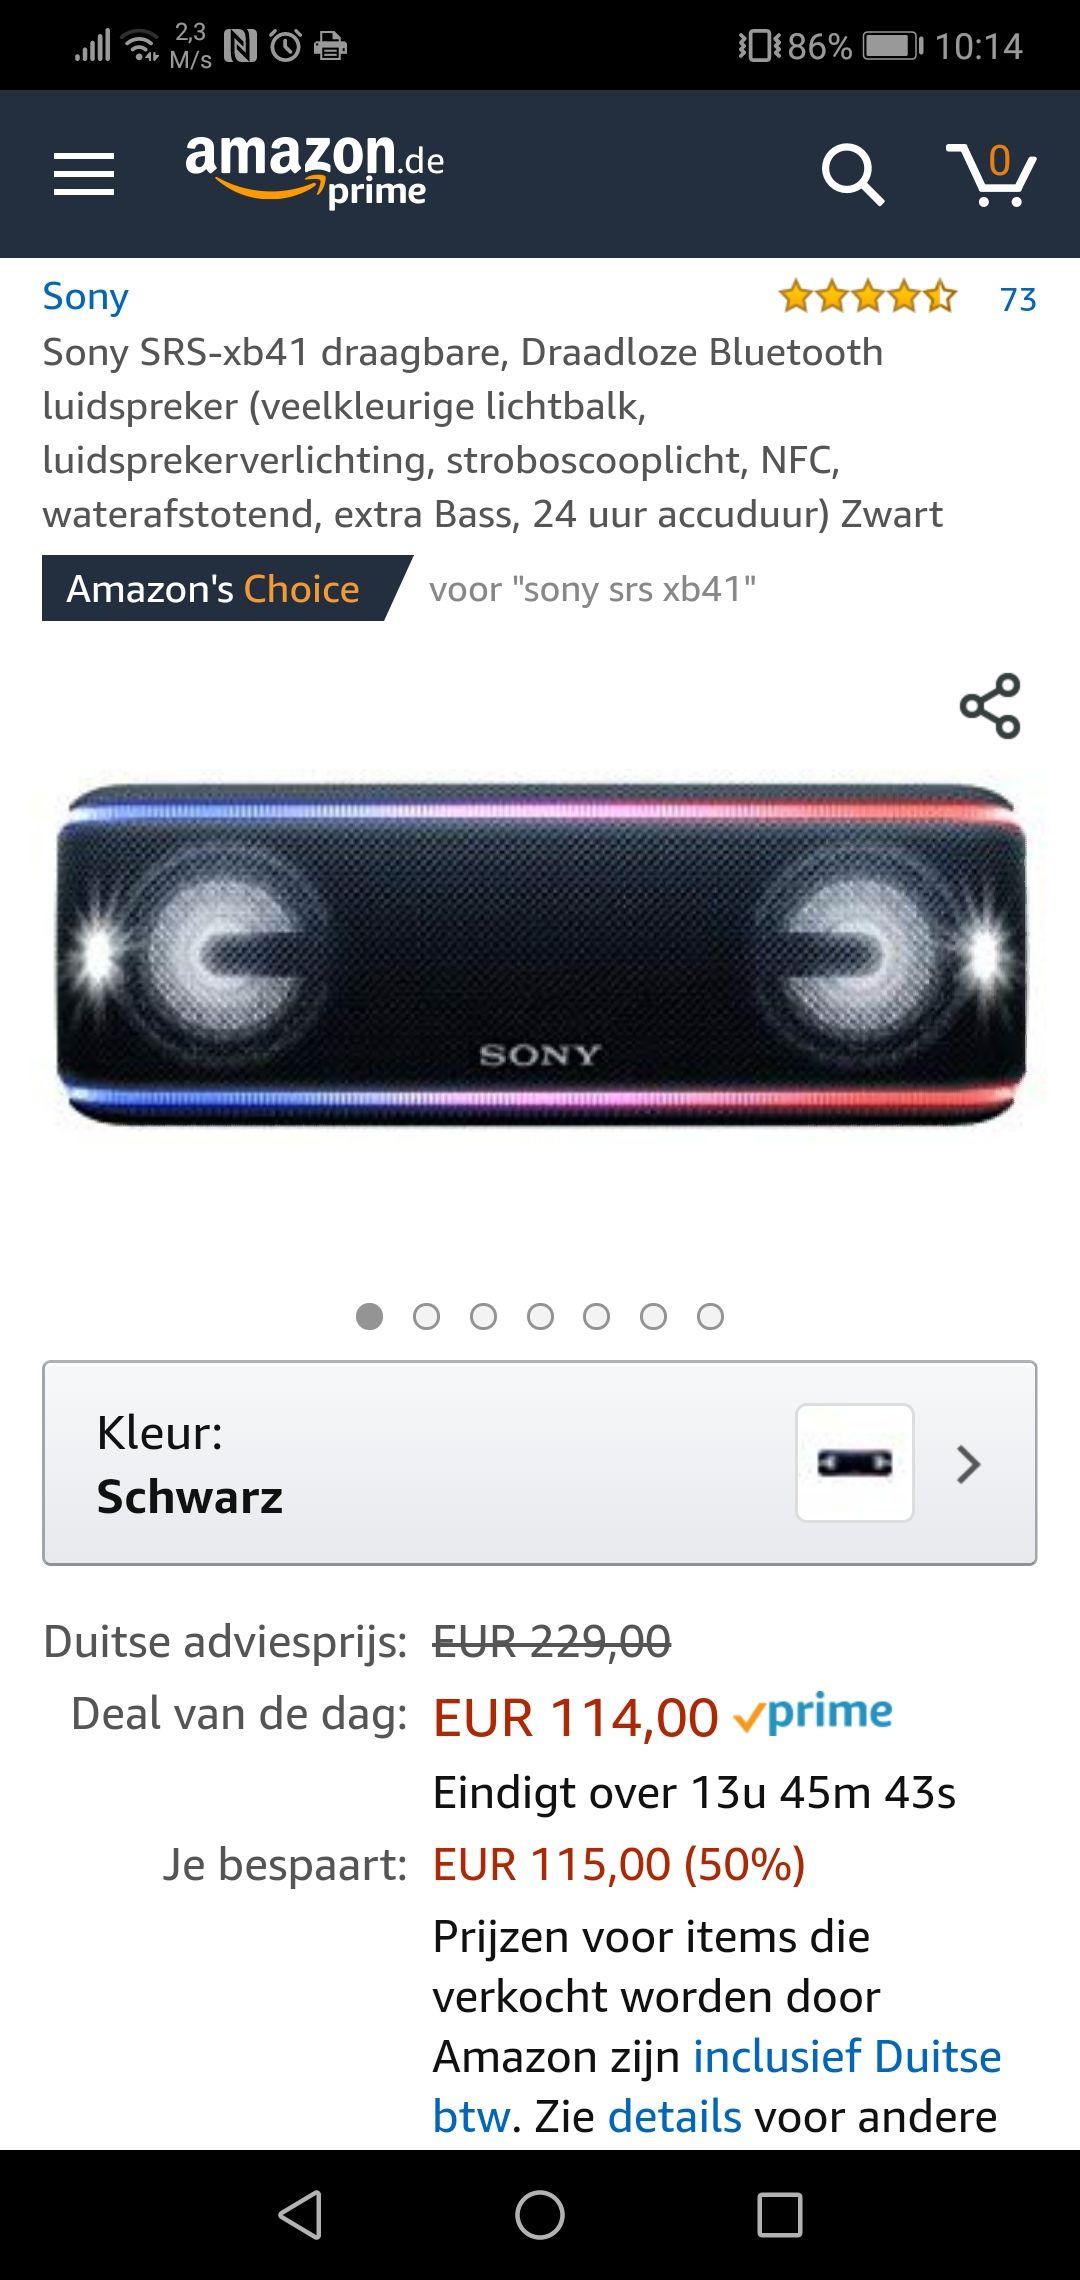 Sony srs-xb41 @ Amazon.de